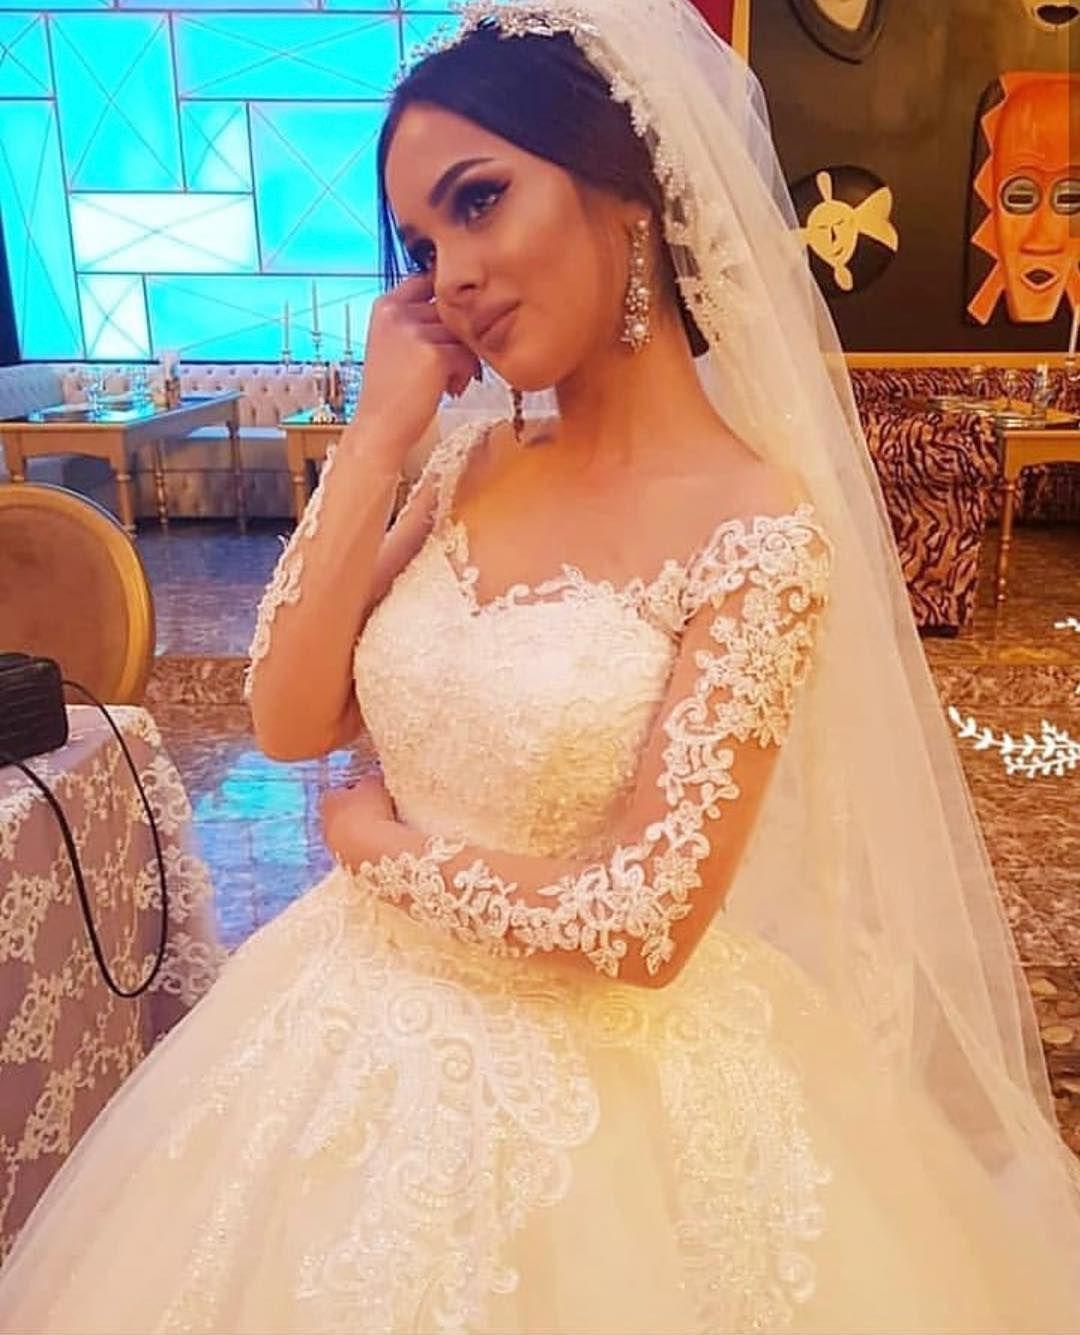 Custom Wedding Dresses And Bespoke Bridal Attire Wedding Dresses Wedding Dress Cost Wedding Dresses Lace [ 1335 x 1080 Pixel ]